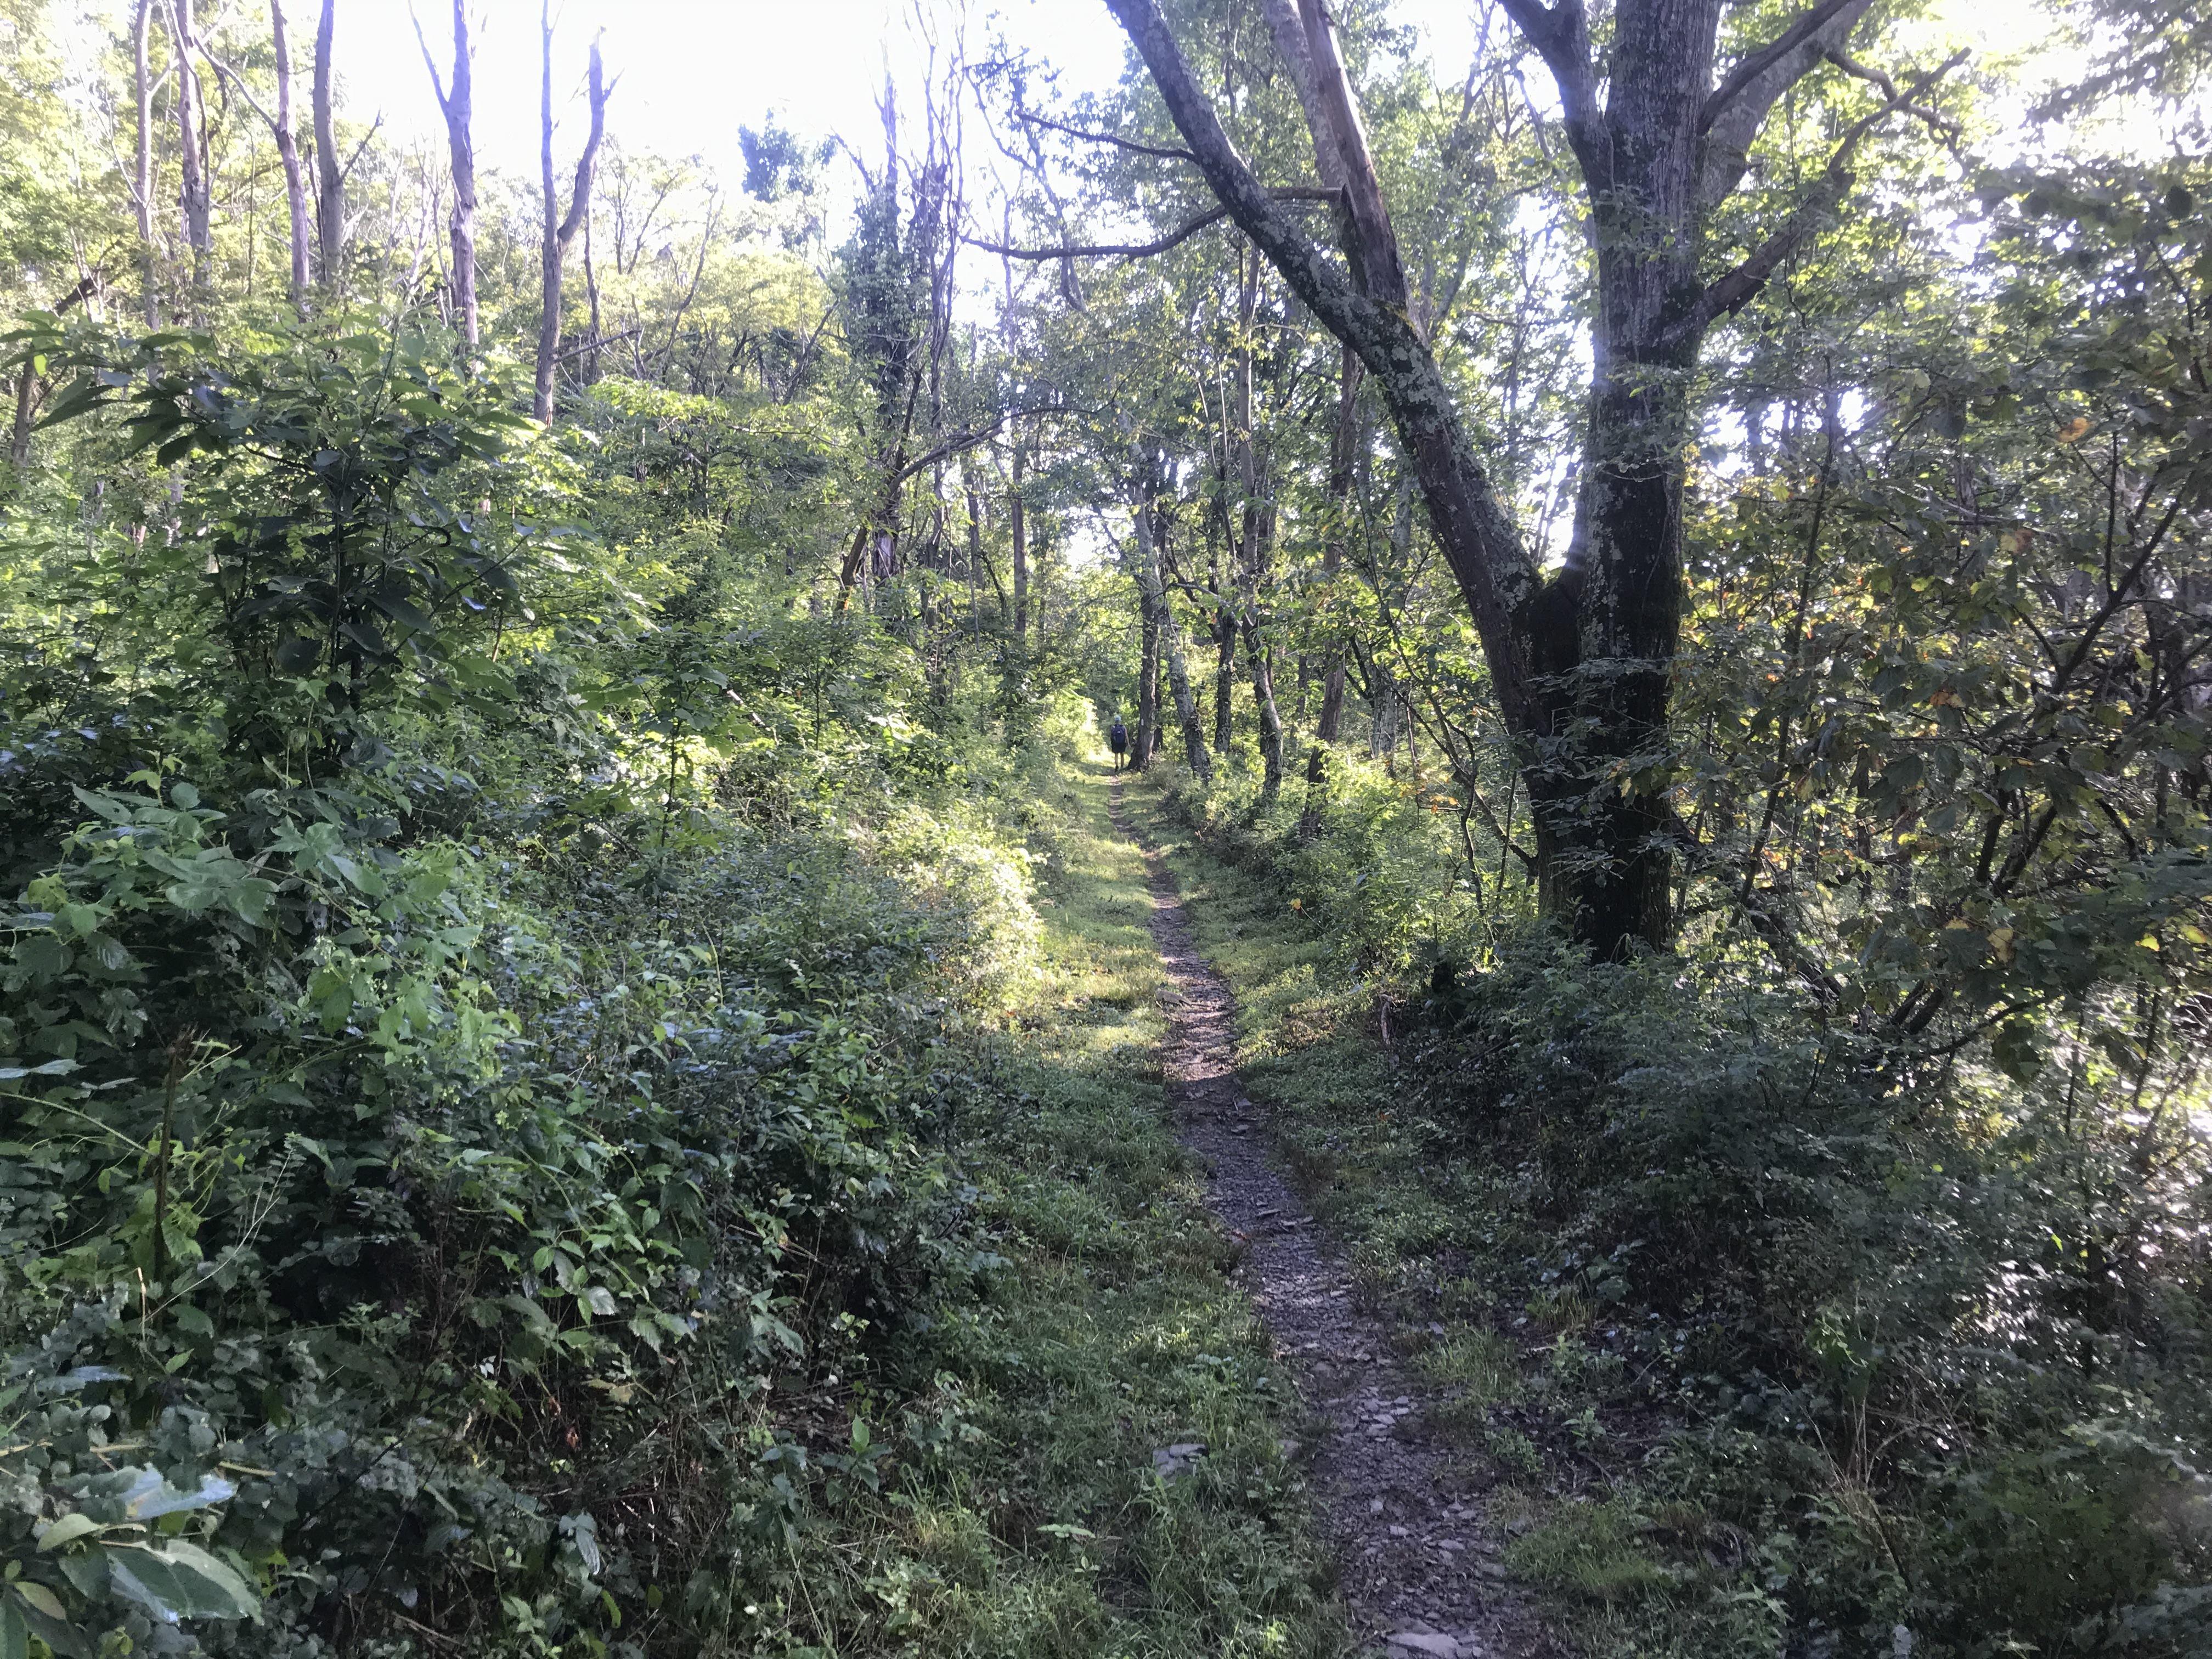 Hike The Appalachian Trail to Ivy Creek